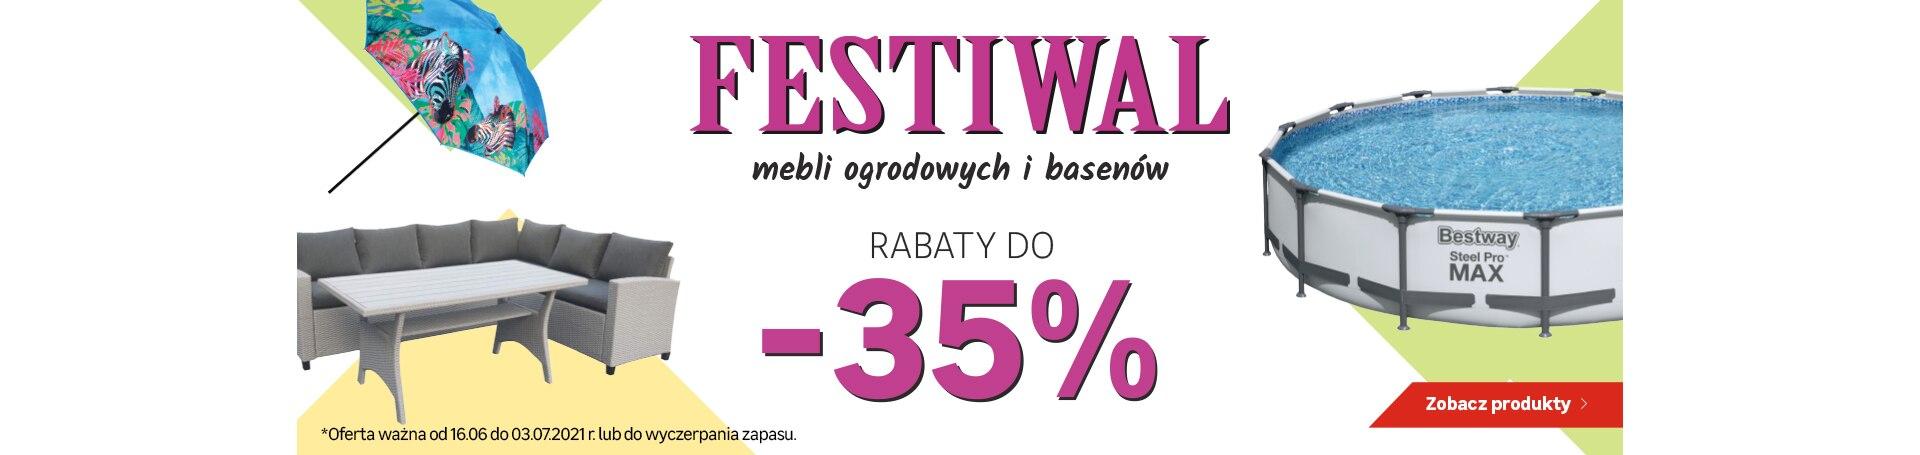 ds-festiwal-mebli-i-basenow-16.06-3.07-1323x455x